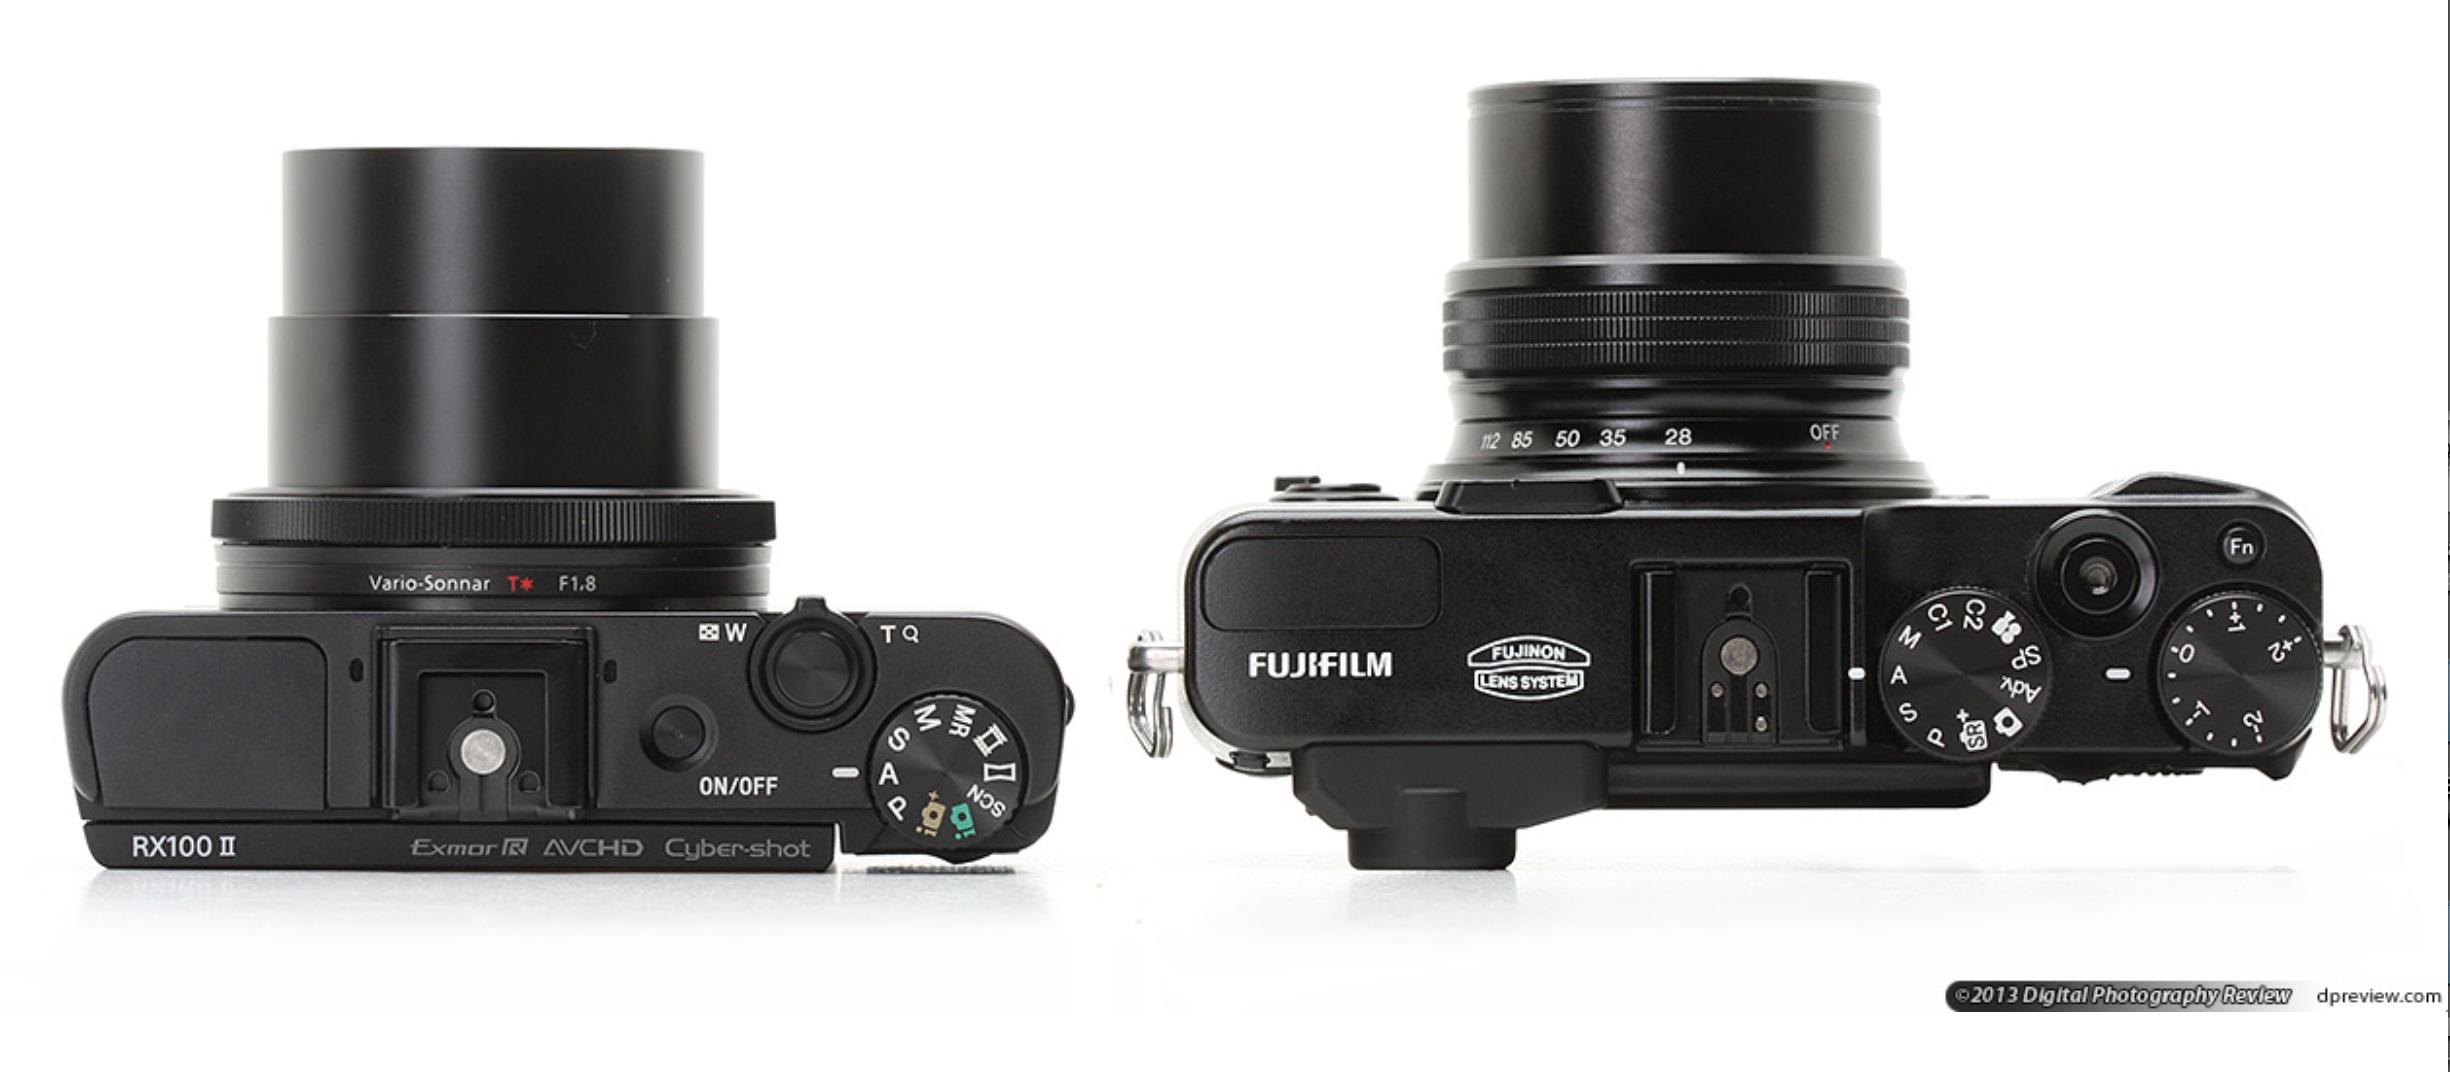 http://thedigitalstory.com/2013/06/27/sony-rx100II-vs-fujifilm-x20.jpg